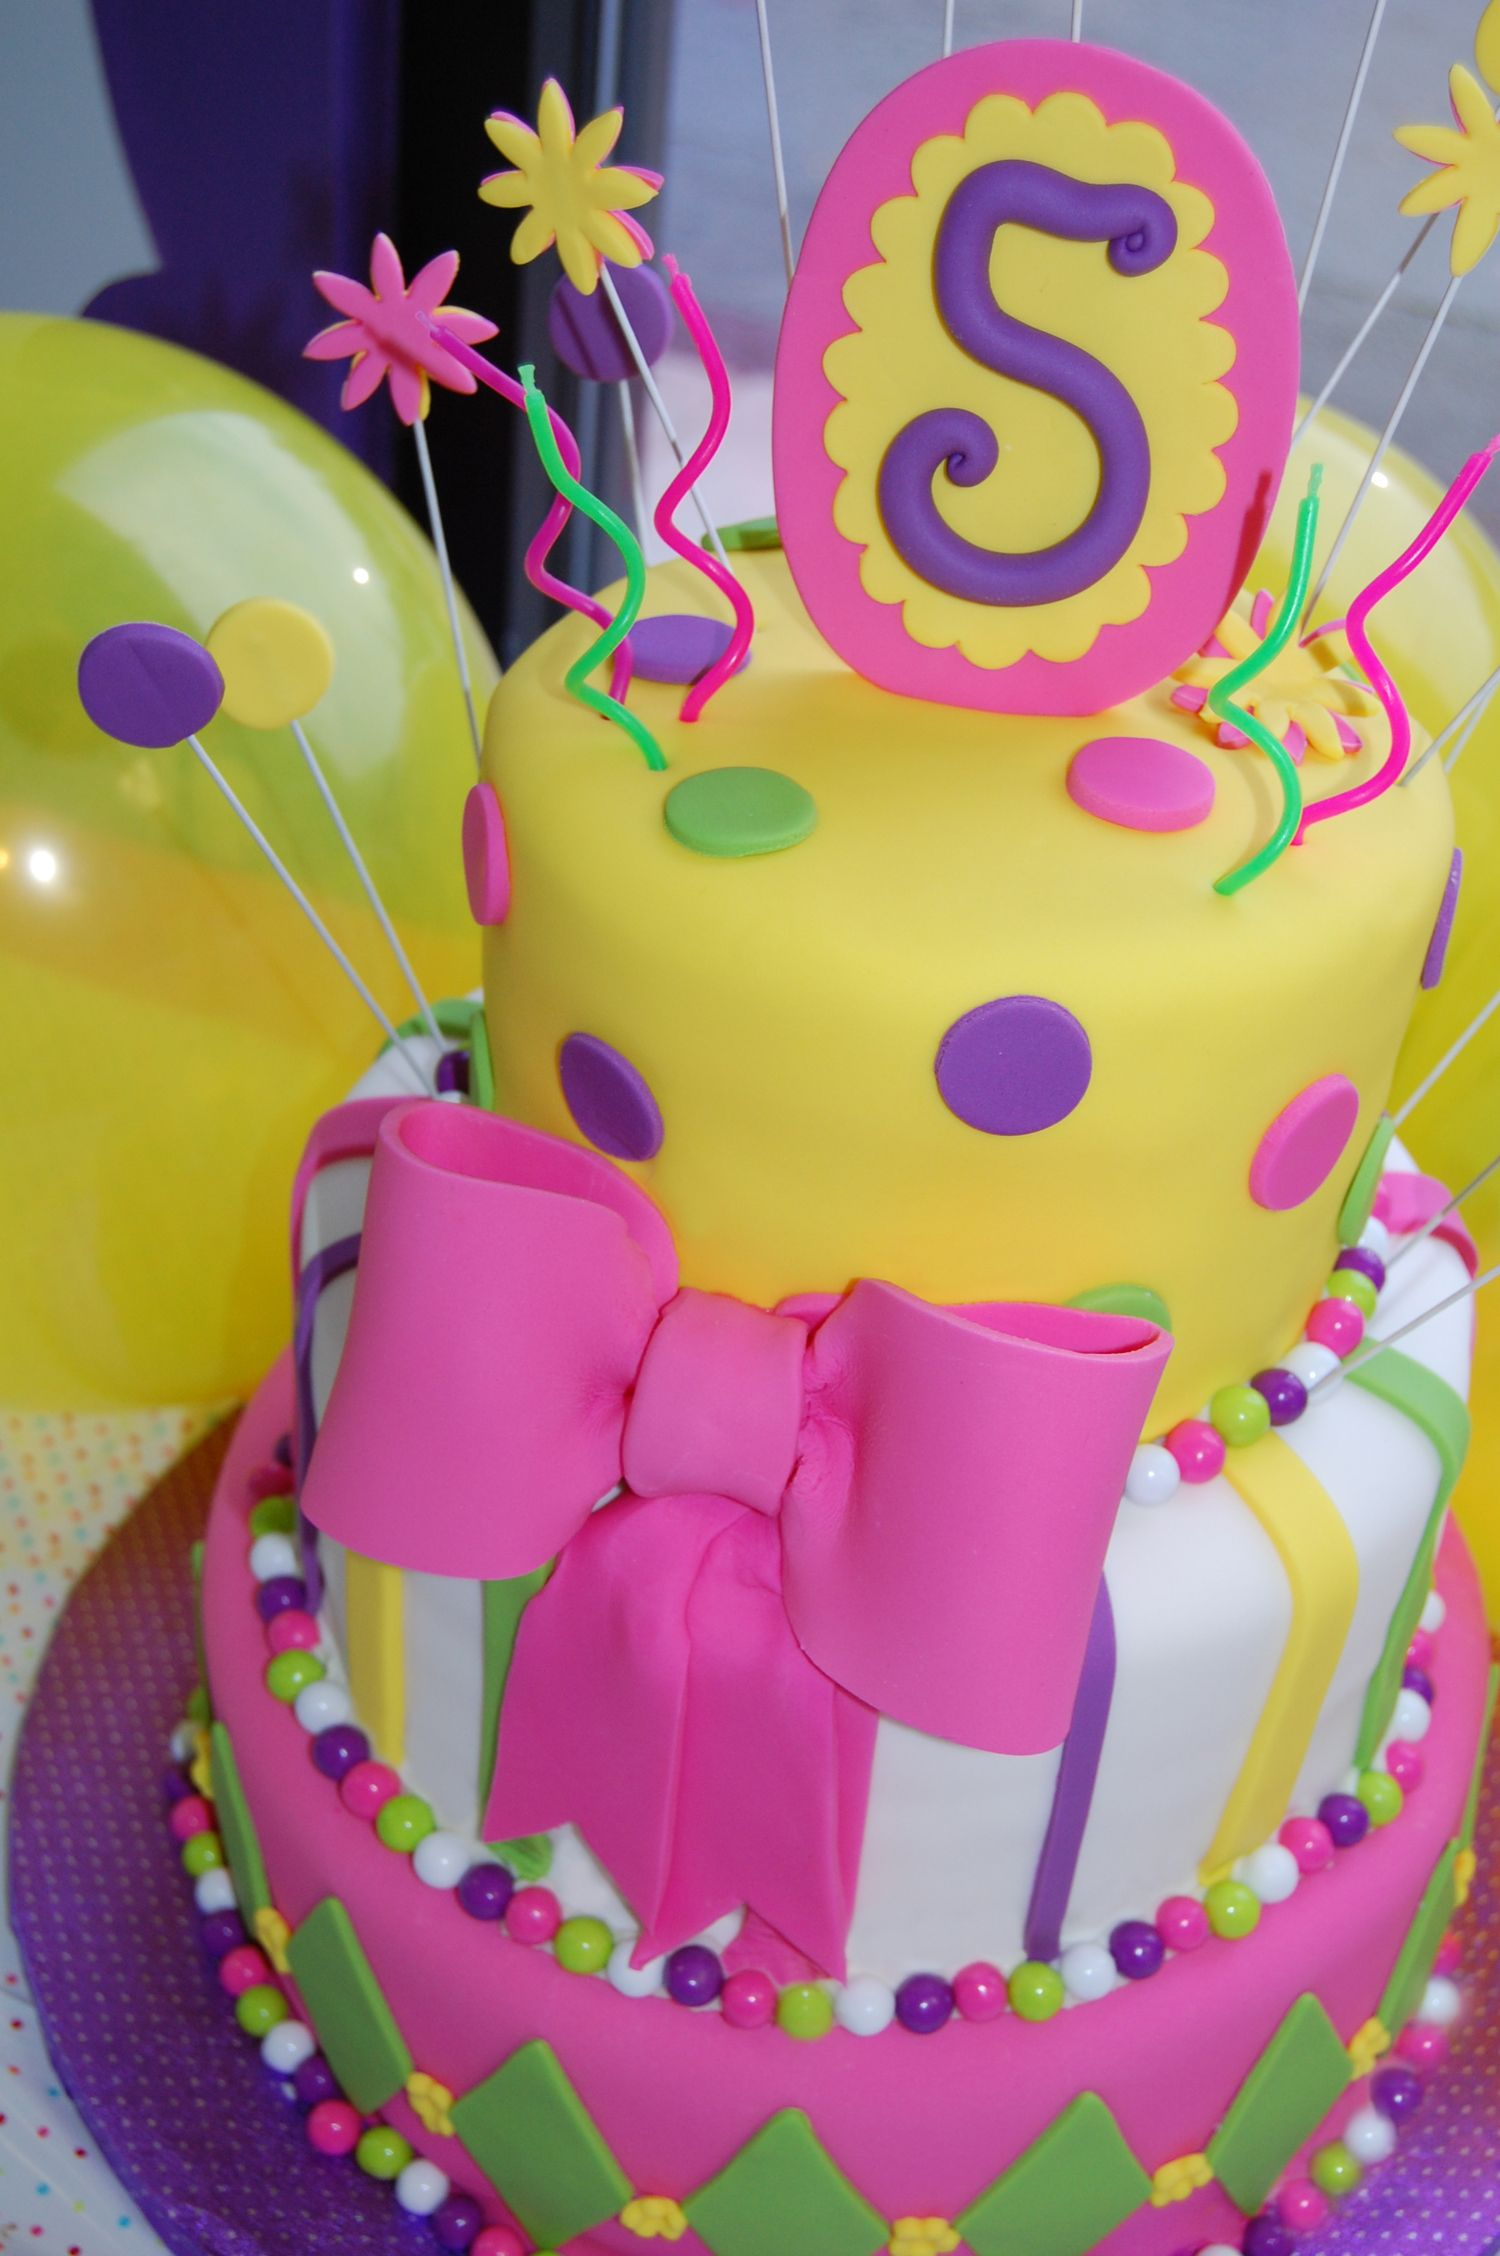 Pink Bow Girl Birthday Cake Whimsical Fondant Covered Girl